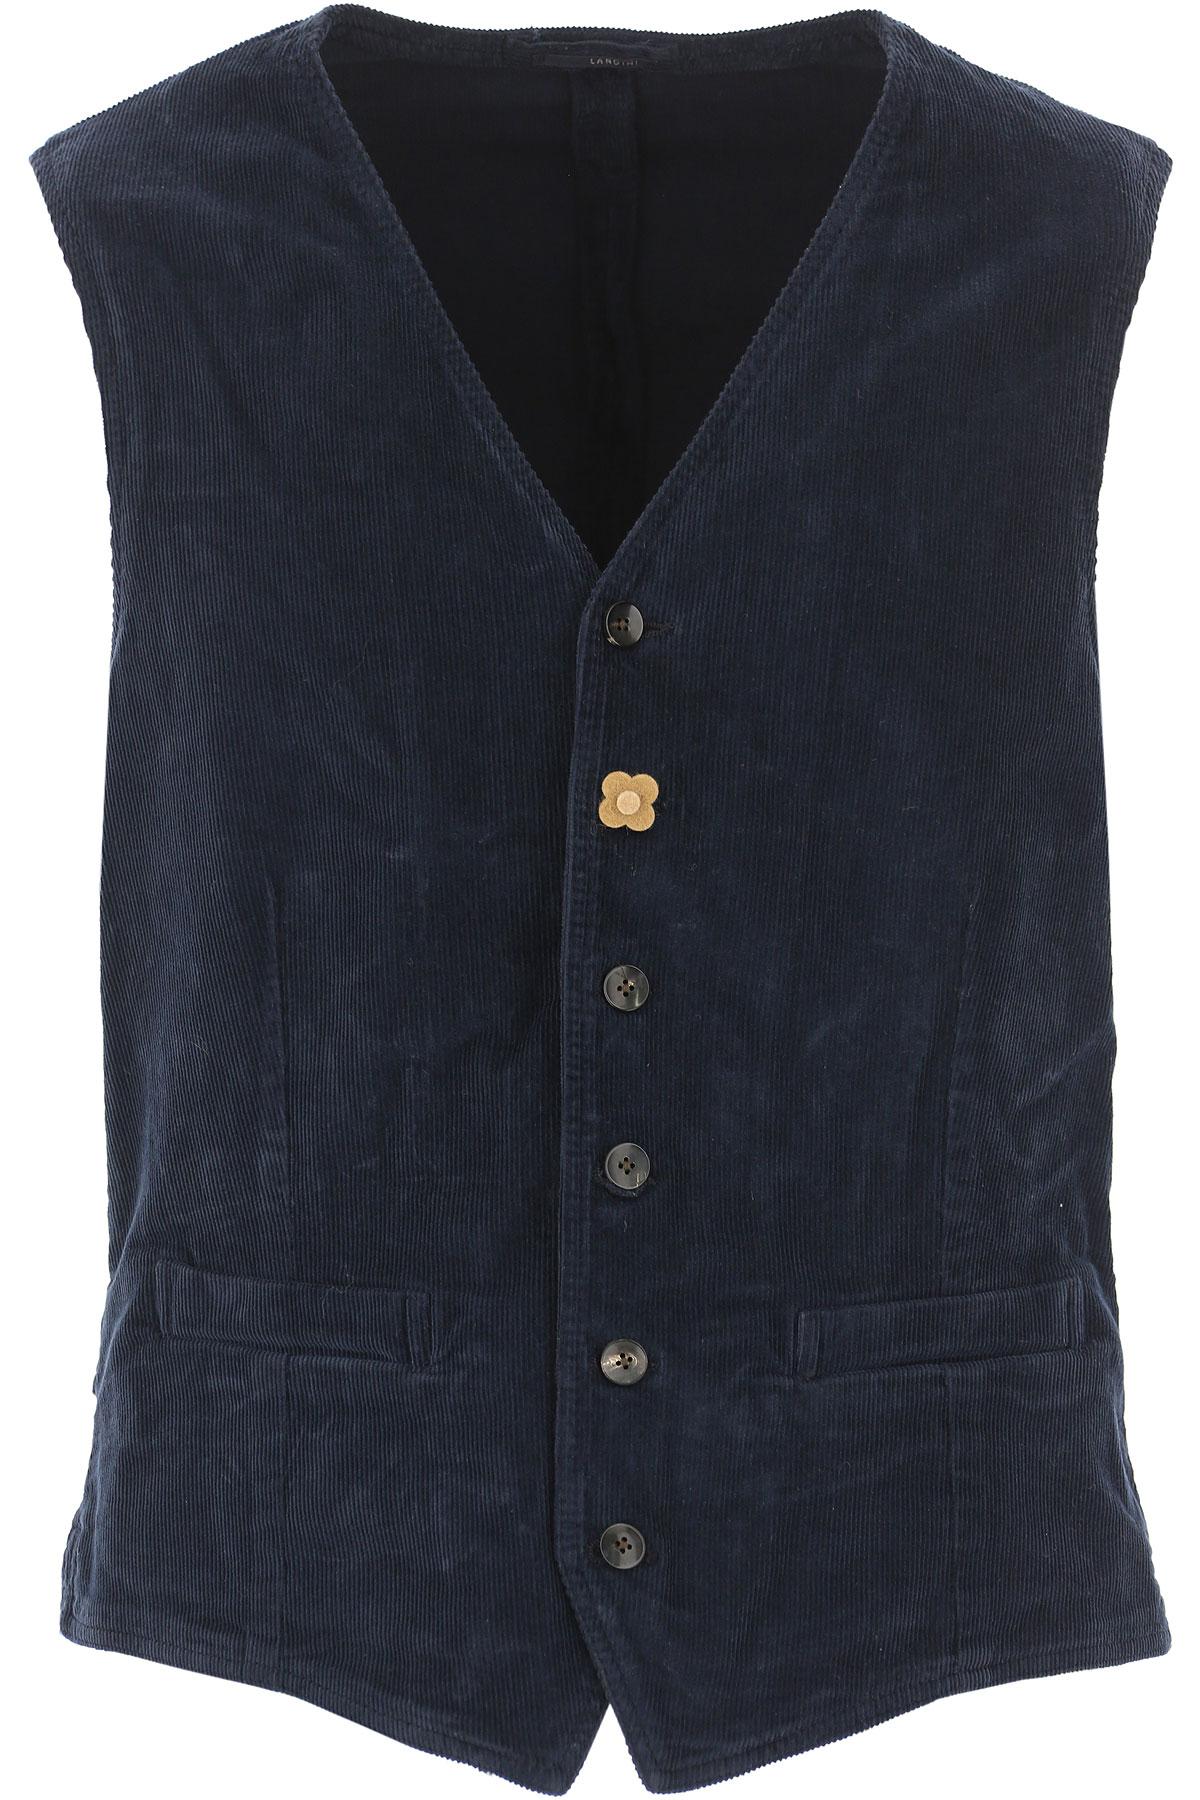 Image of Lardini Jacket for Men, Navy Blue, Cotton, 2017, XL XXL